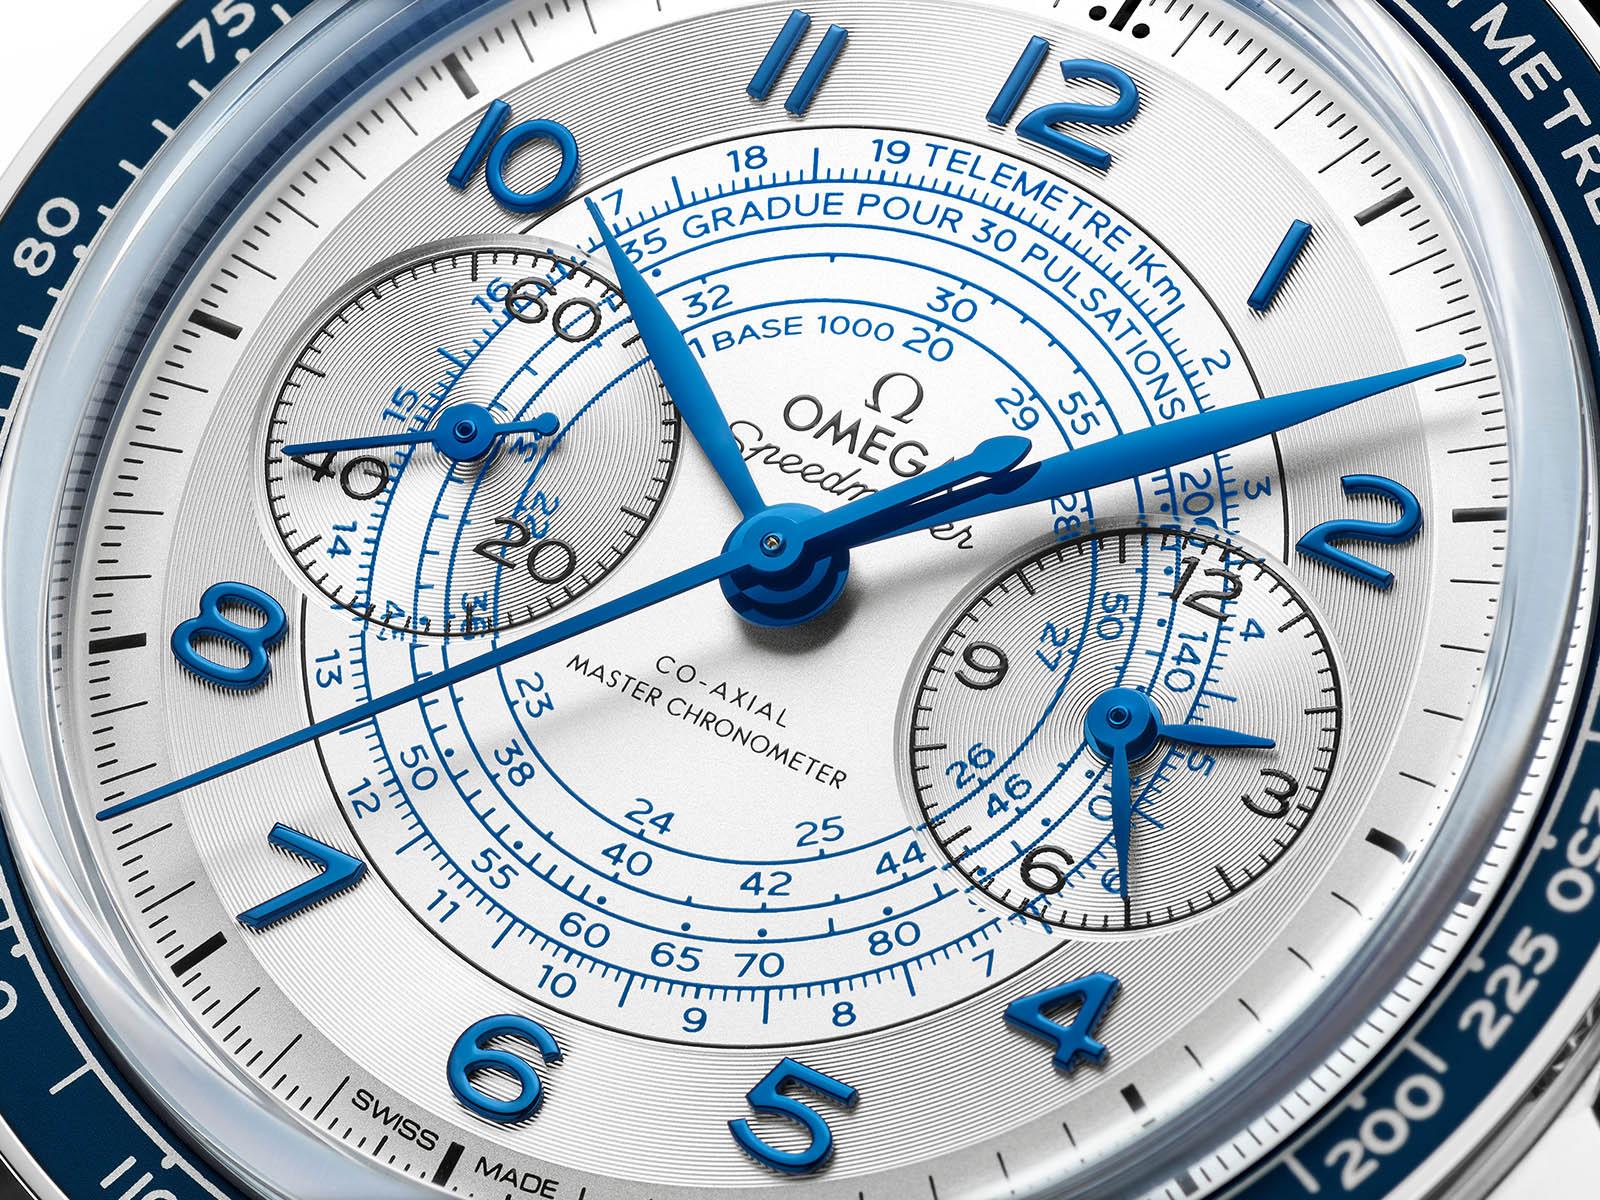 omega-speedmaster-chronoscope-co-axial-master-chronometer-chronograph-5.jpg